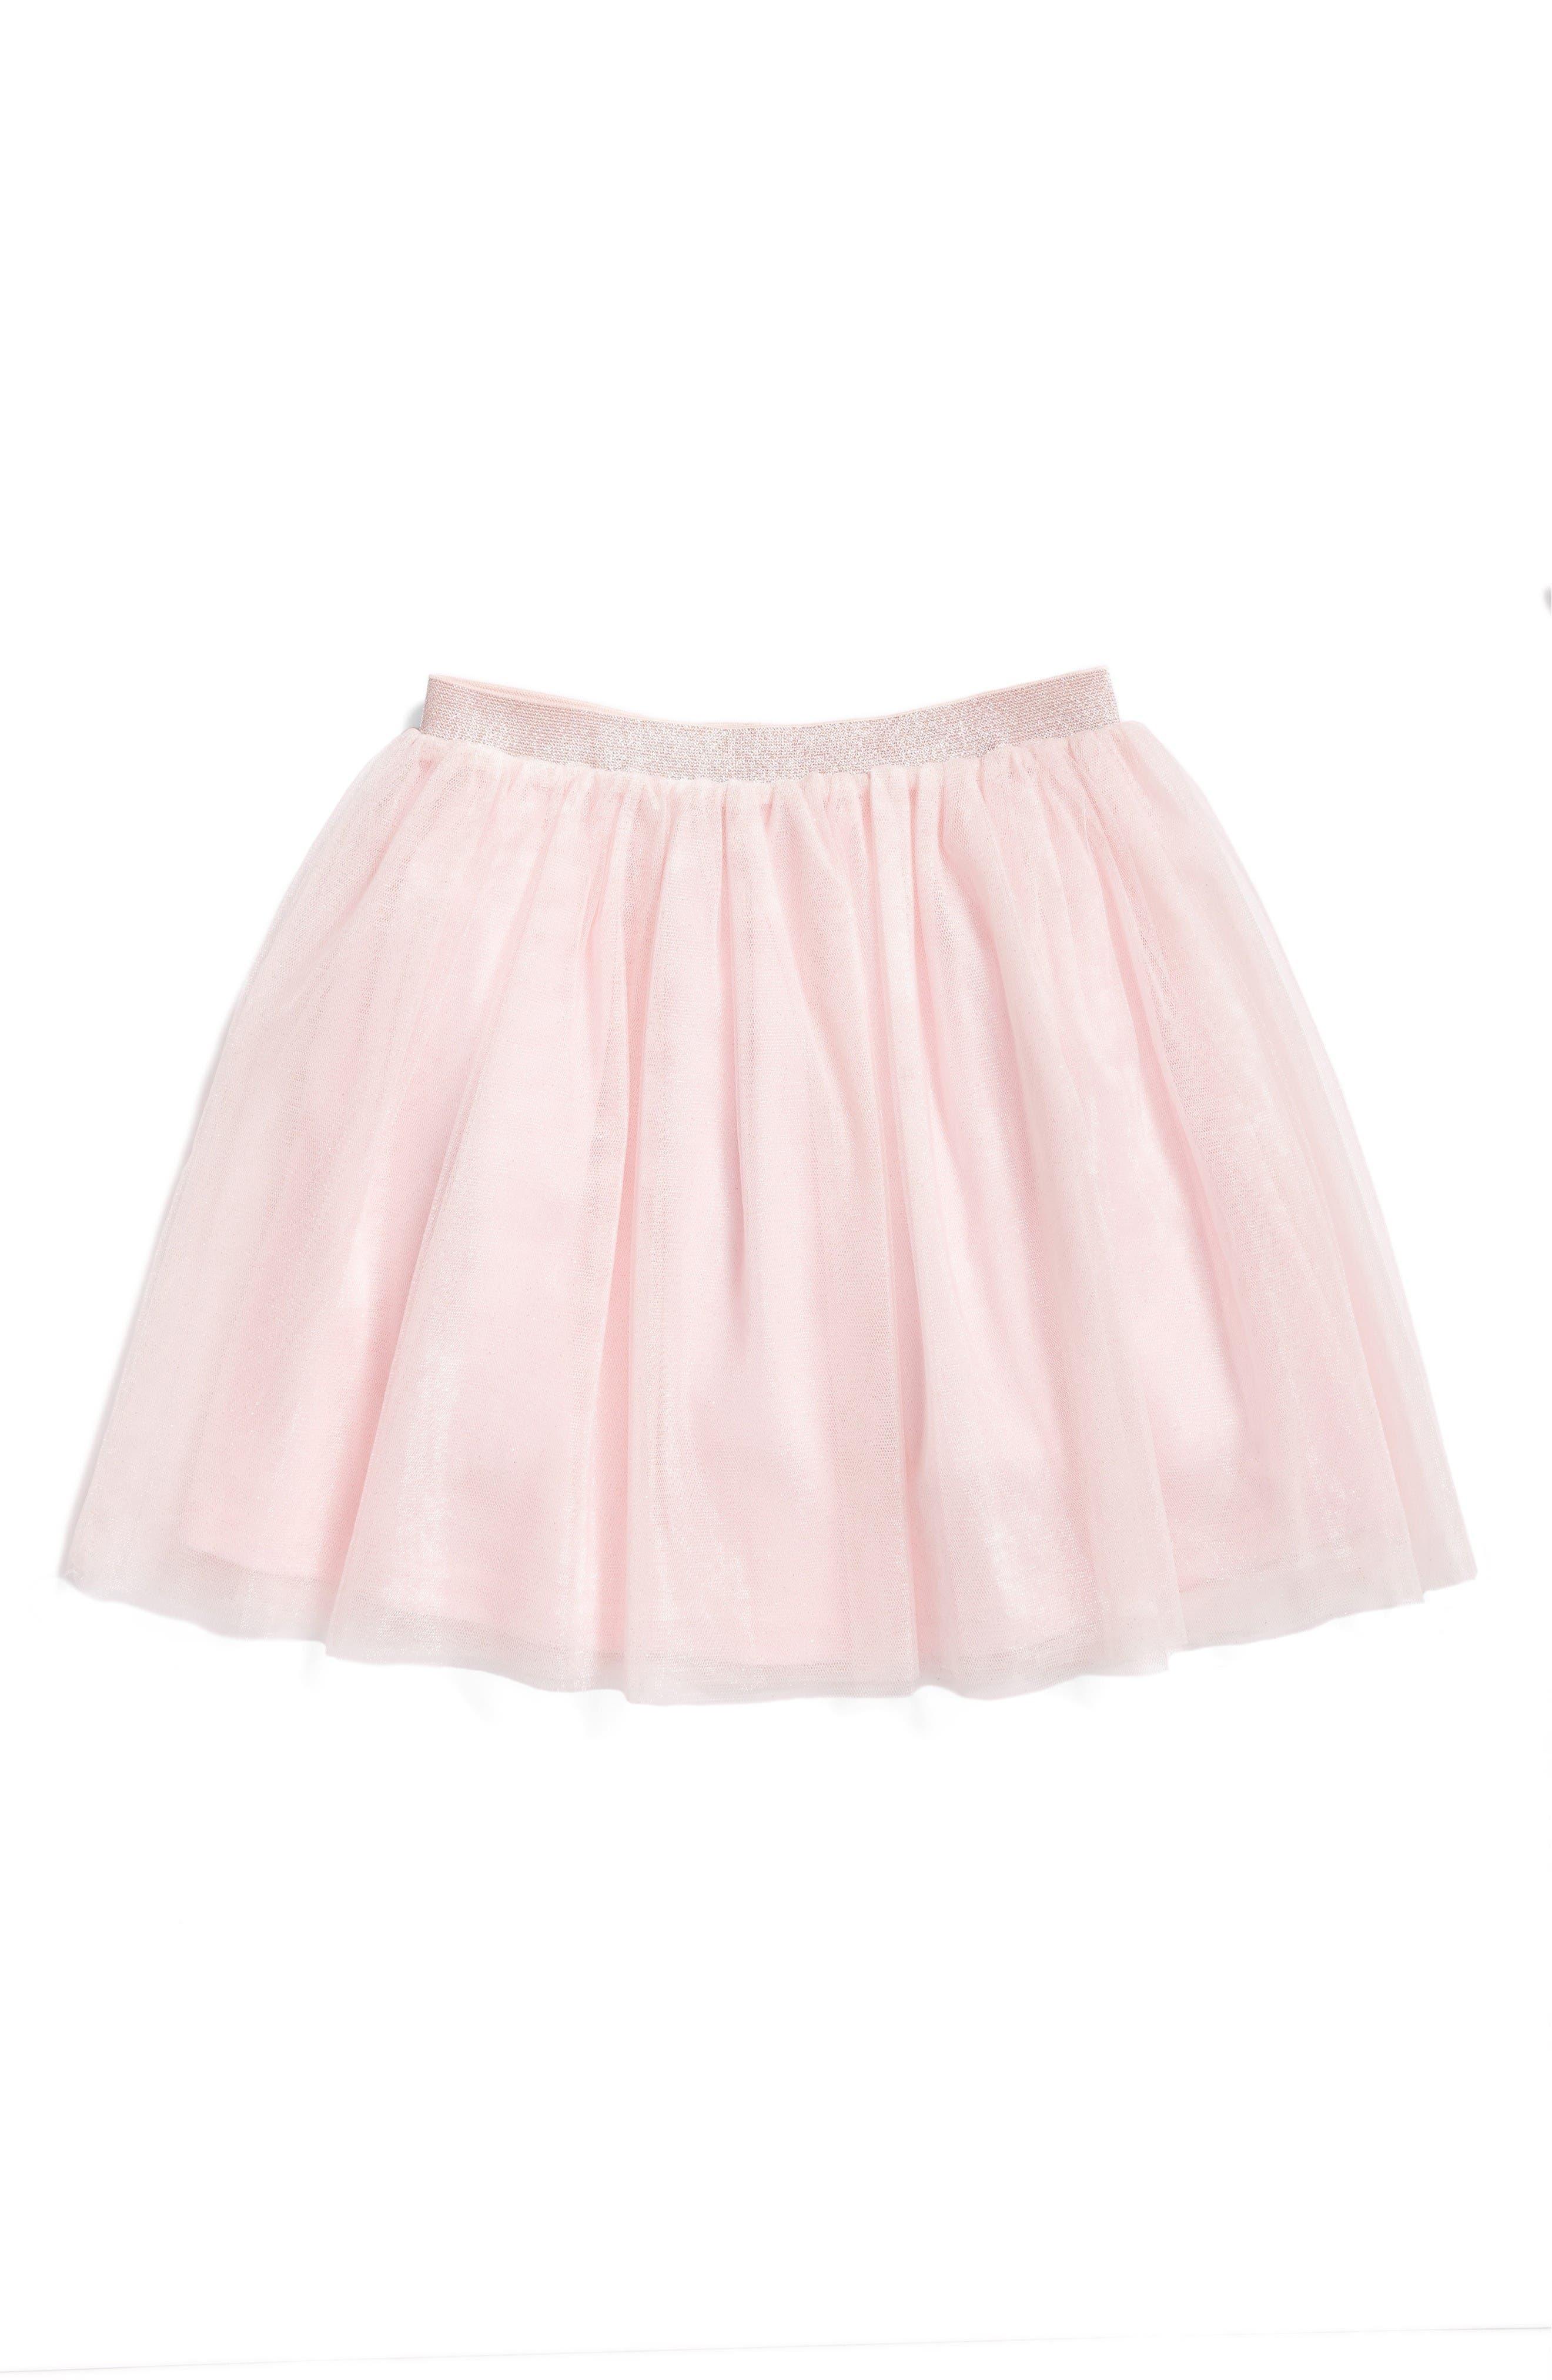 TRULY ME Metallic Tutu Skirt